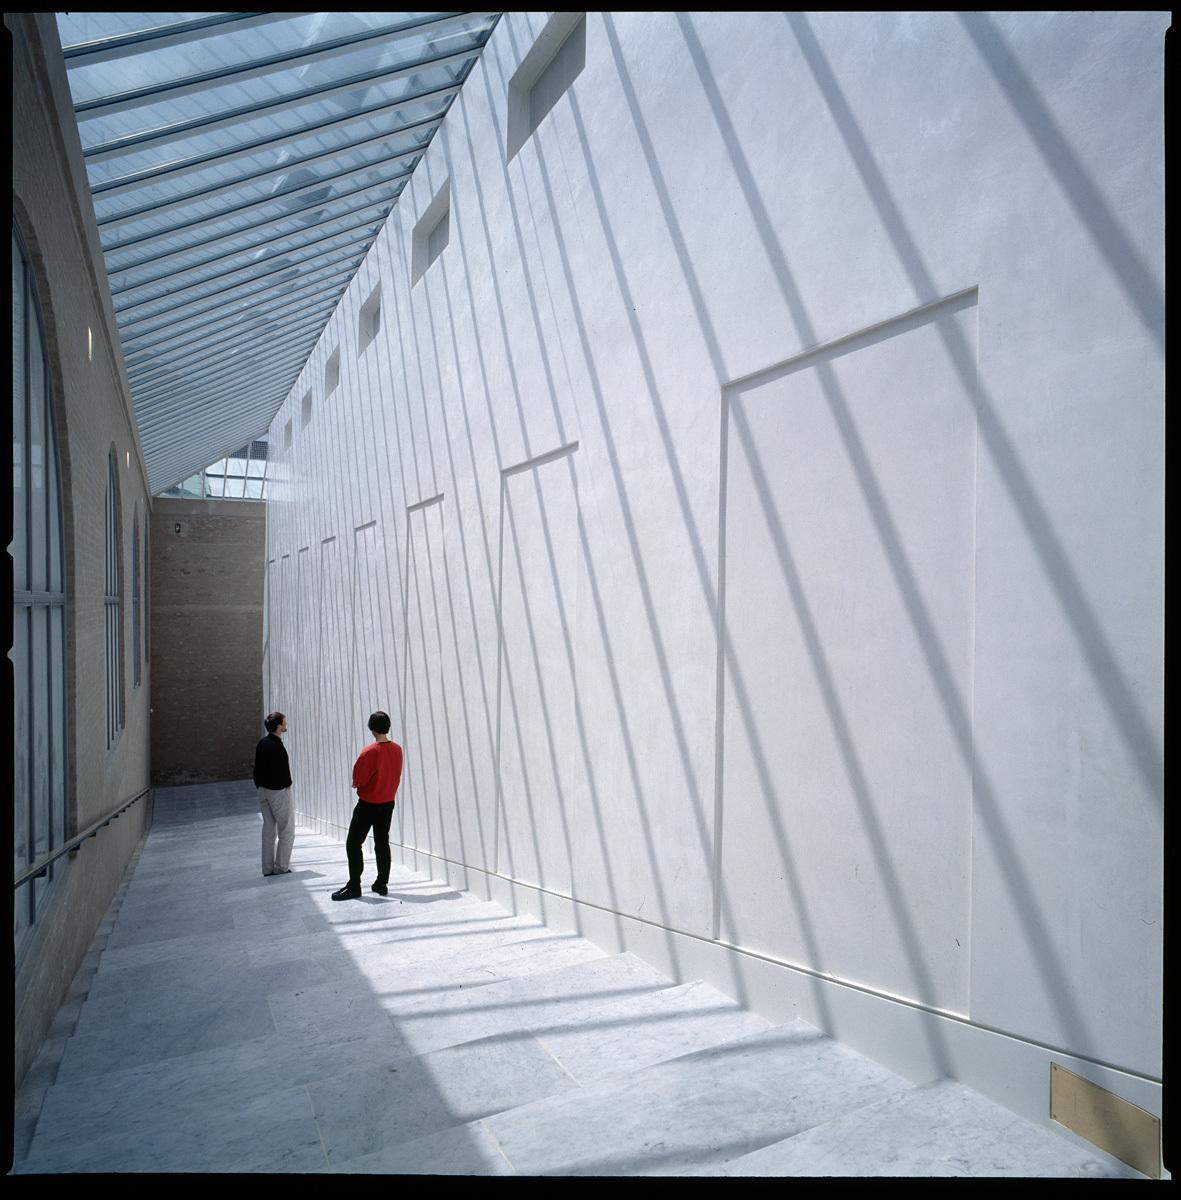 Ny Carlsberg Glyptotek (Denmark, 1996, Photo: Jens Lindhe)